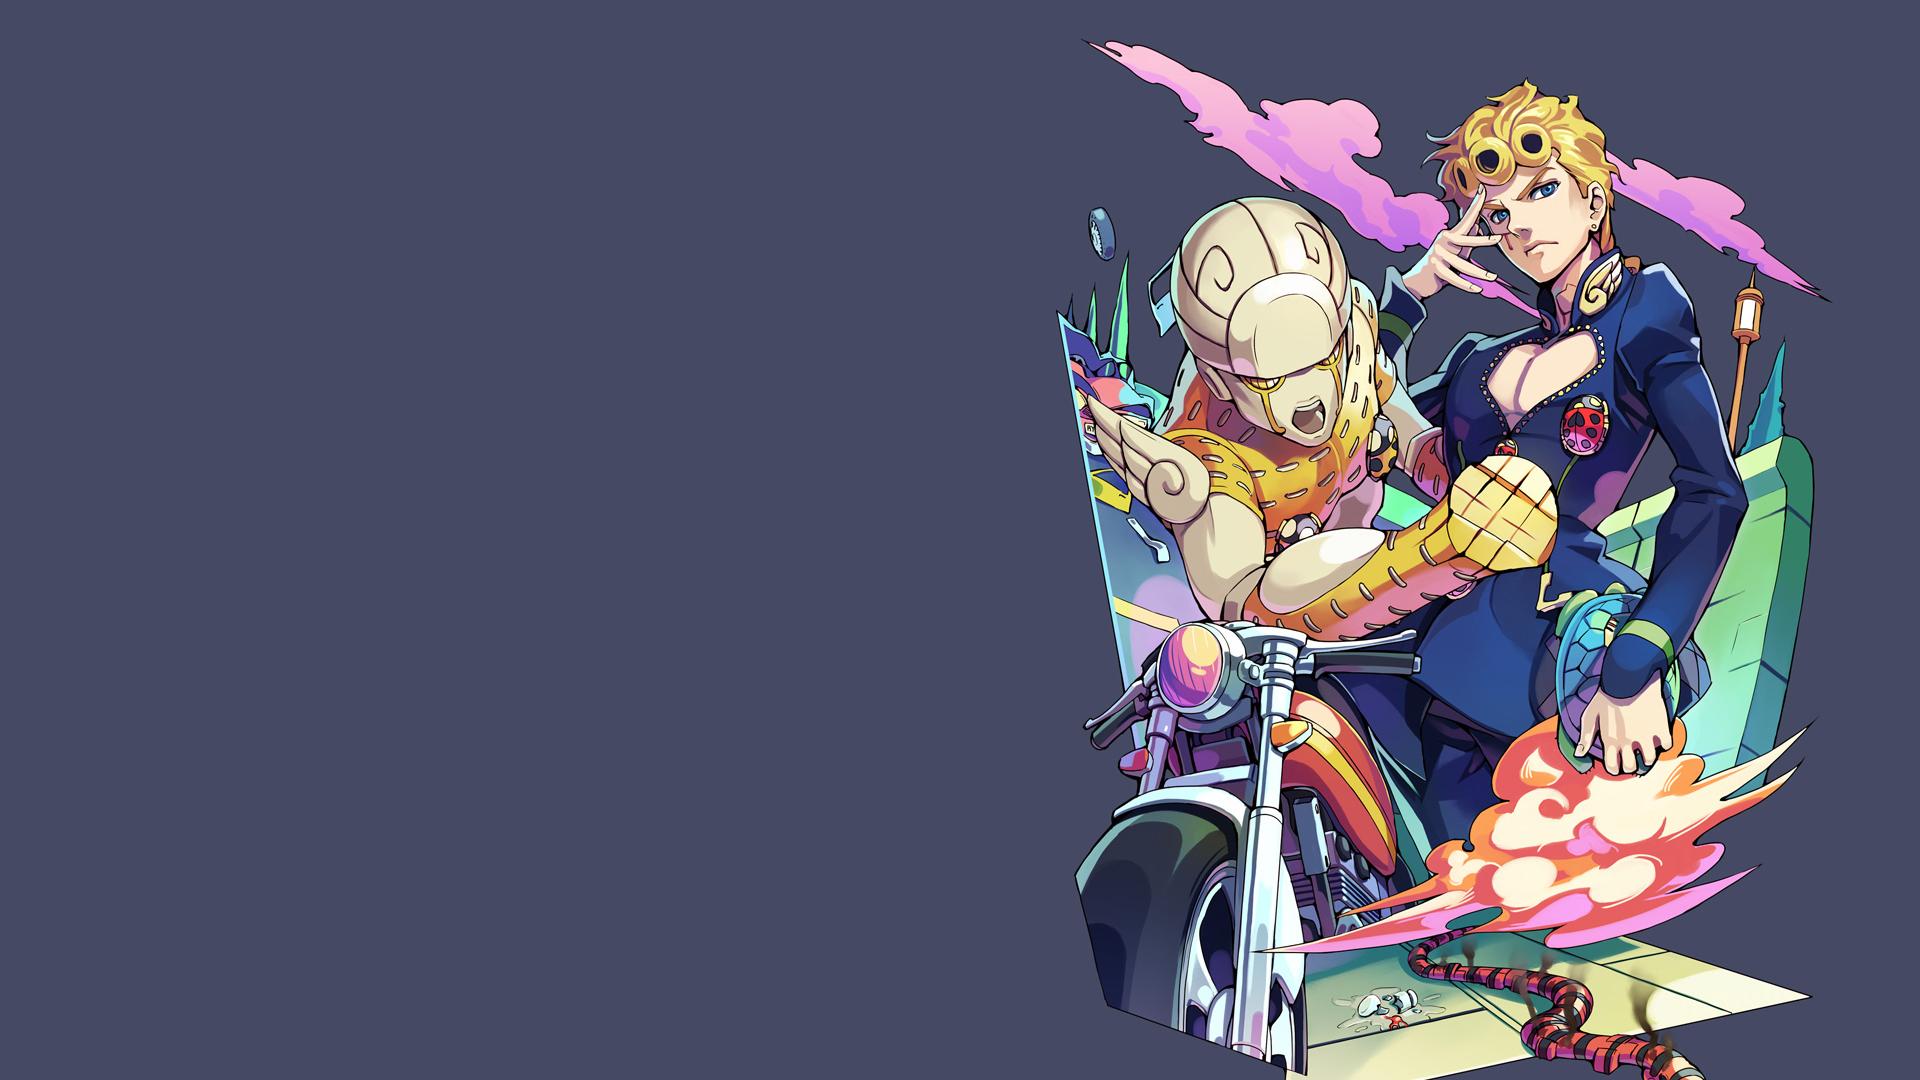 Image 540763 jojos bizarre adventure know your meme t shirt cartoon fictional character anime voltagebd Images